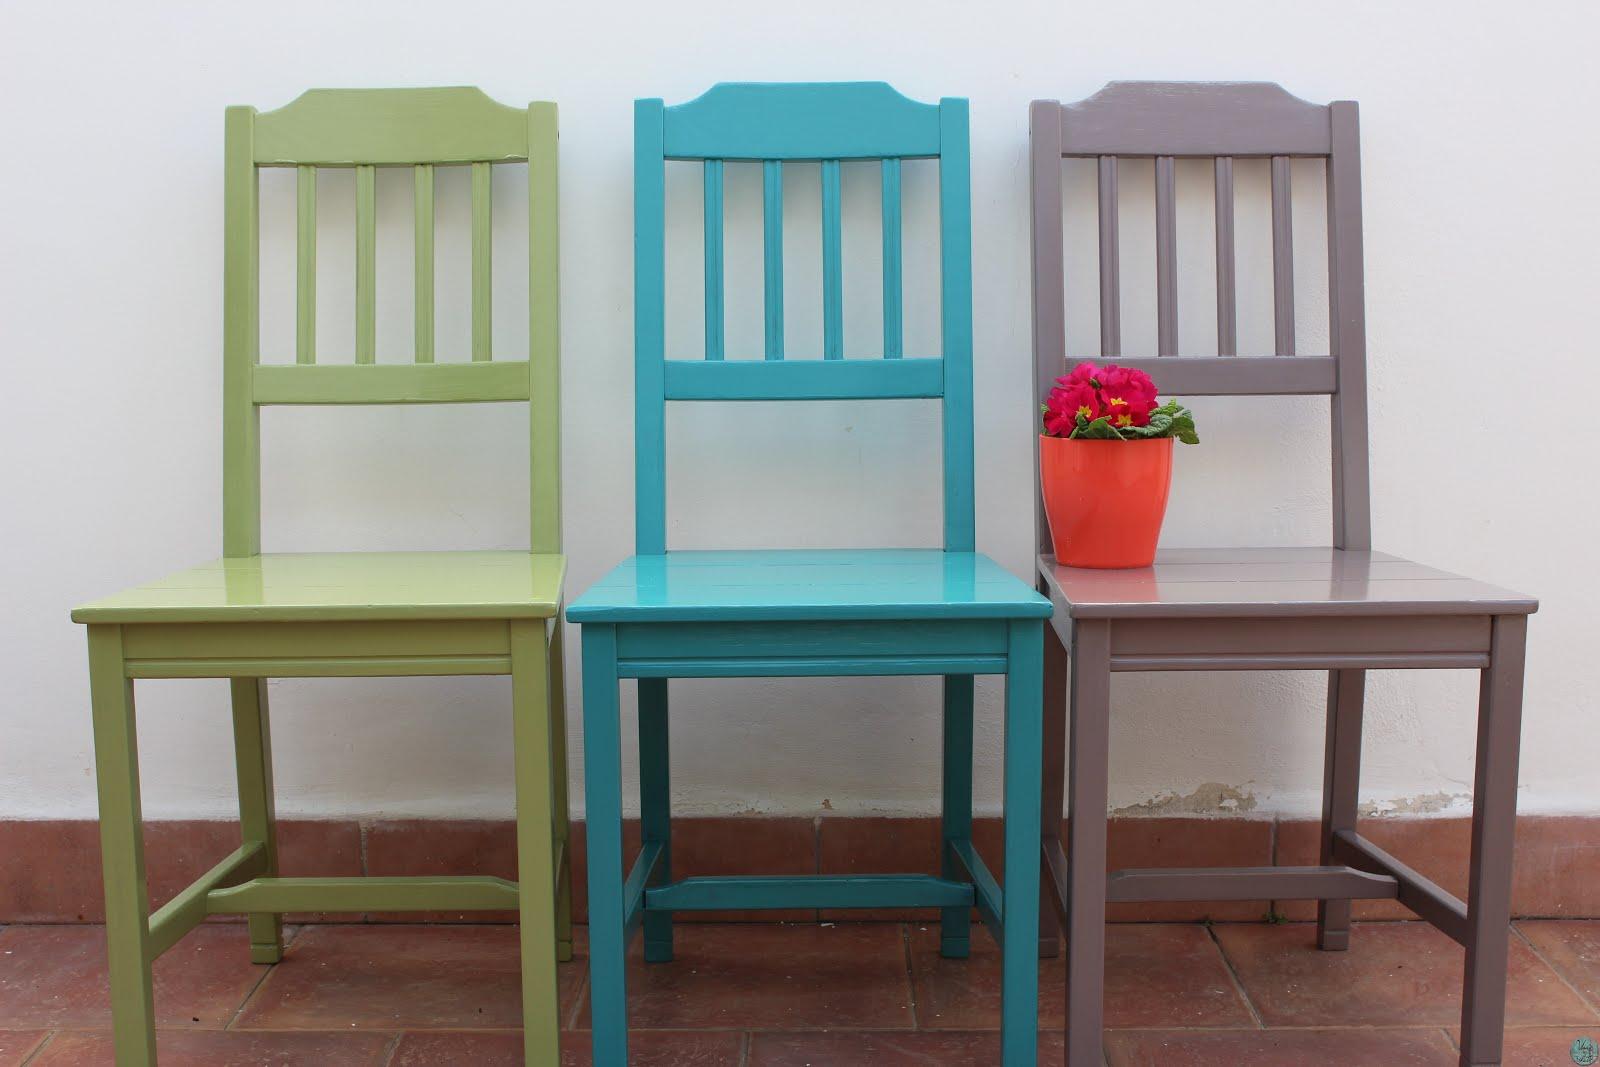 Sedie In Legno Colorate : Sedie in legno colorate sedie colorate sedie scegliere e